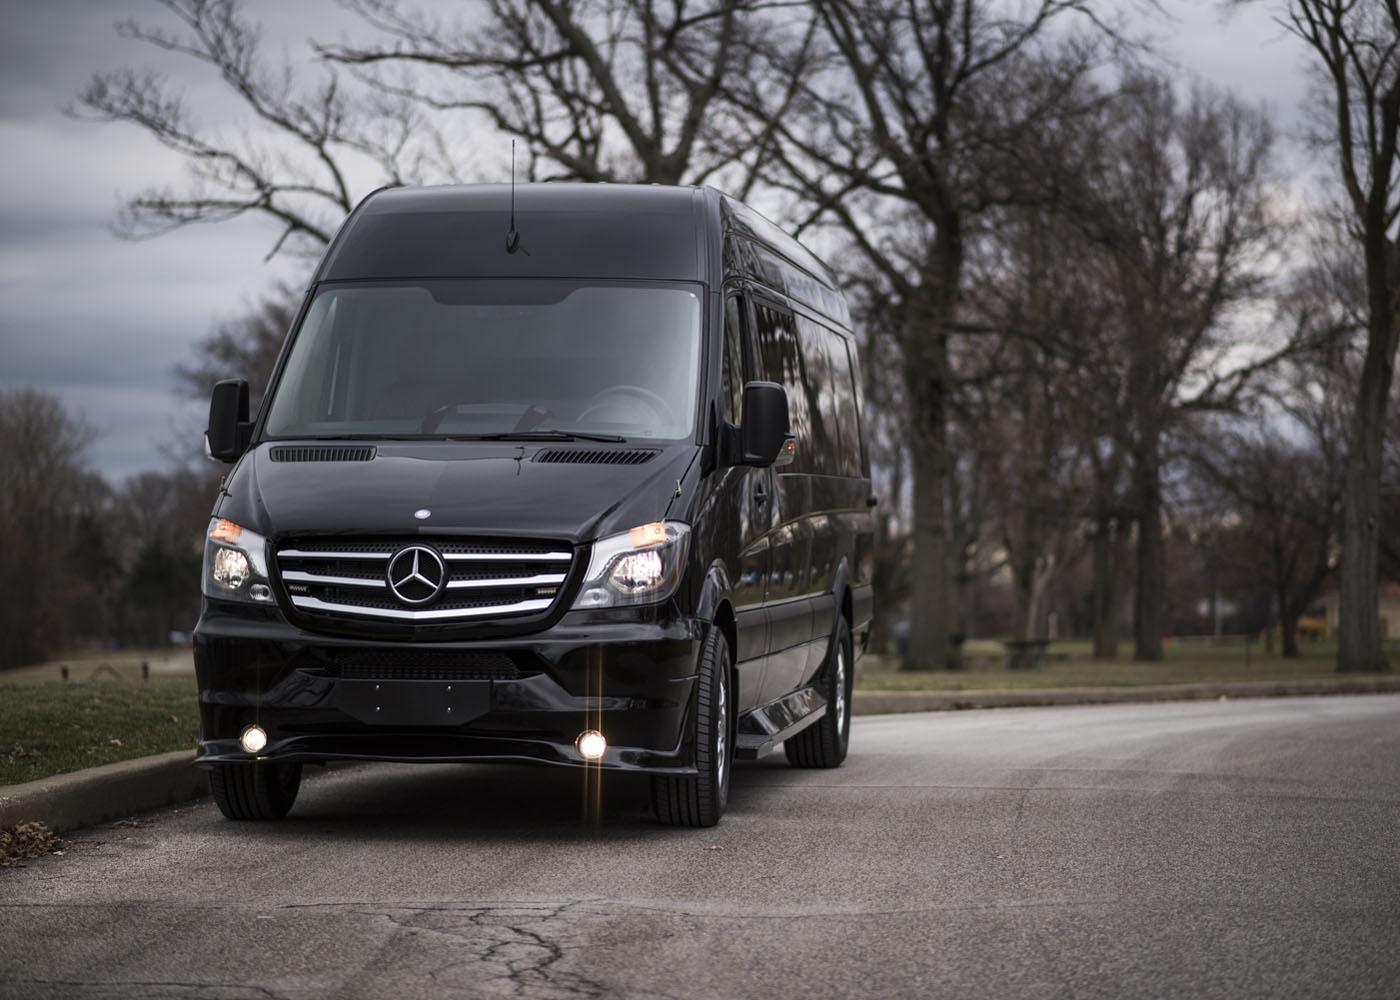 Midwest Automotive Design - Luxury Custom Sprinter Vans - American